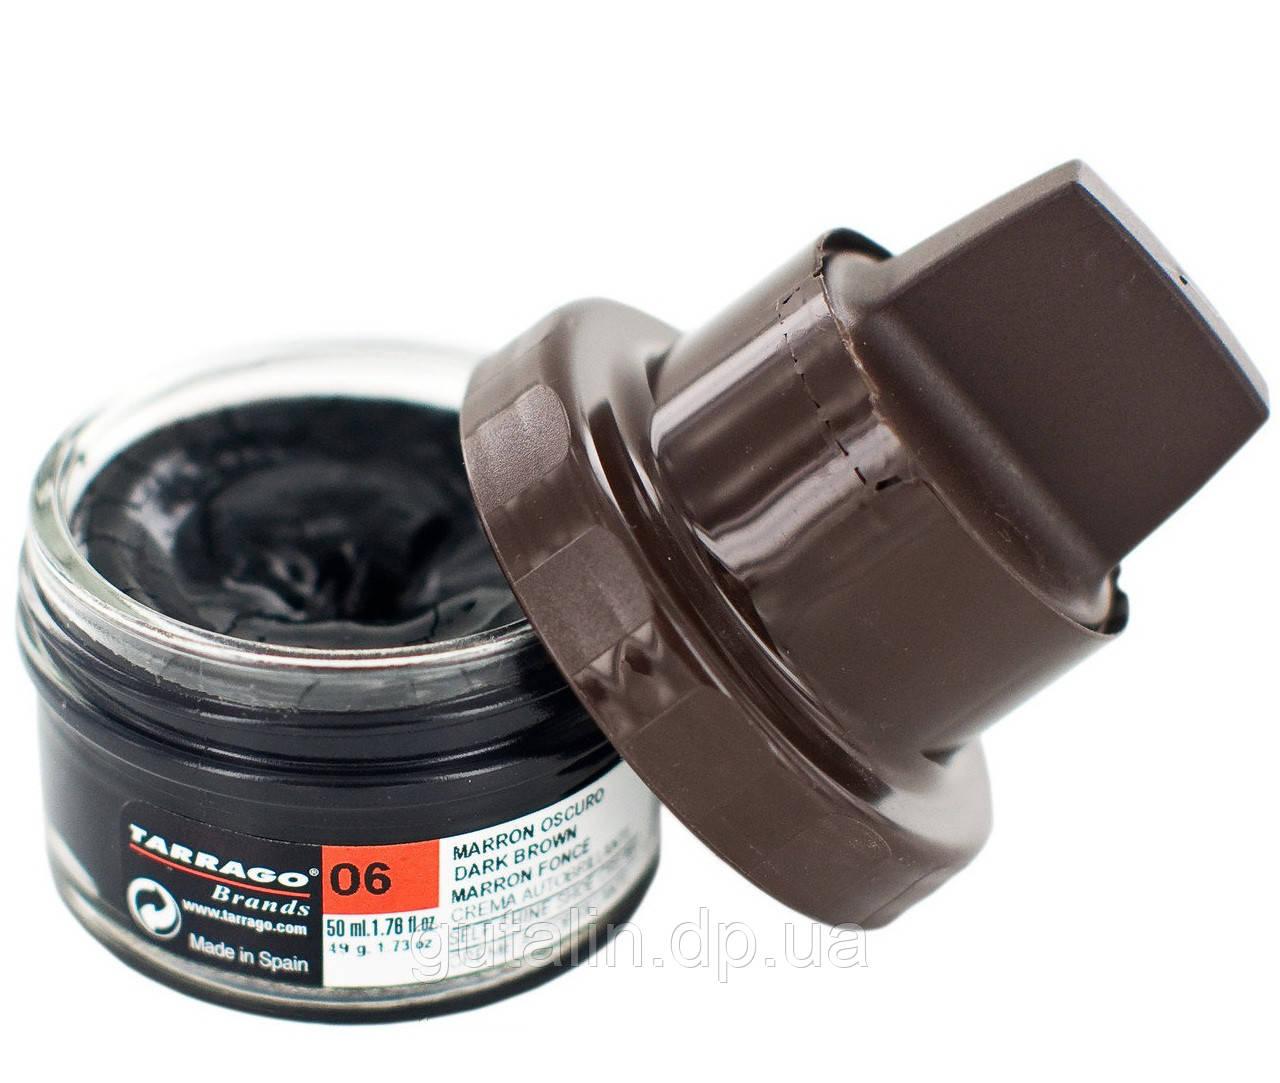 Крем для обуви Tarrago Self Shine Kit Cream 50 мл темно-коричневый (06)